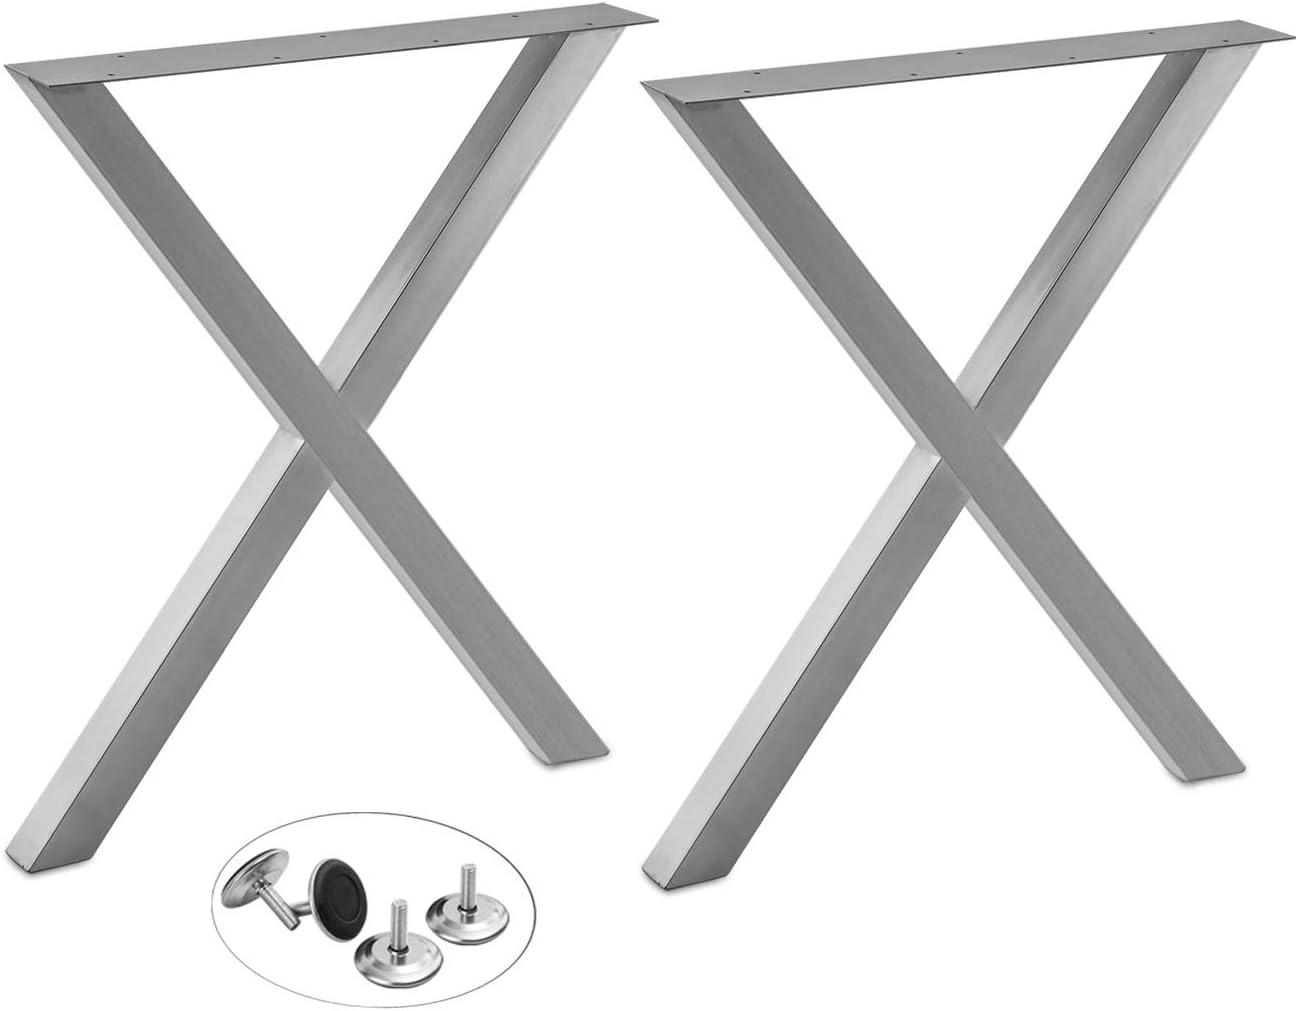 X Shape Furniture Legs- 2 Pack - 28H24W - w/Adjustable Leveling Feet - DIY Stainless Steel Hairpin Legs,Coffee Table Legs,Bench Legs, Desk Legs